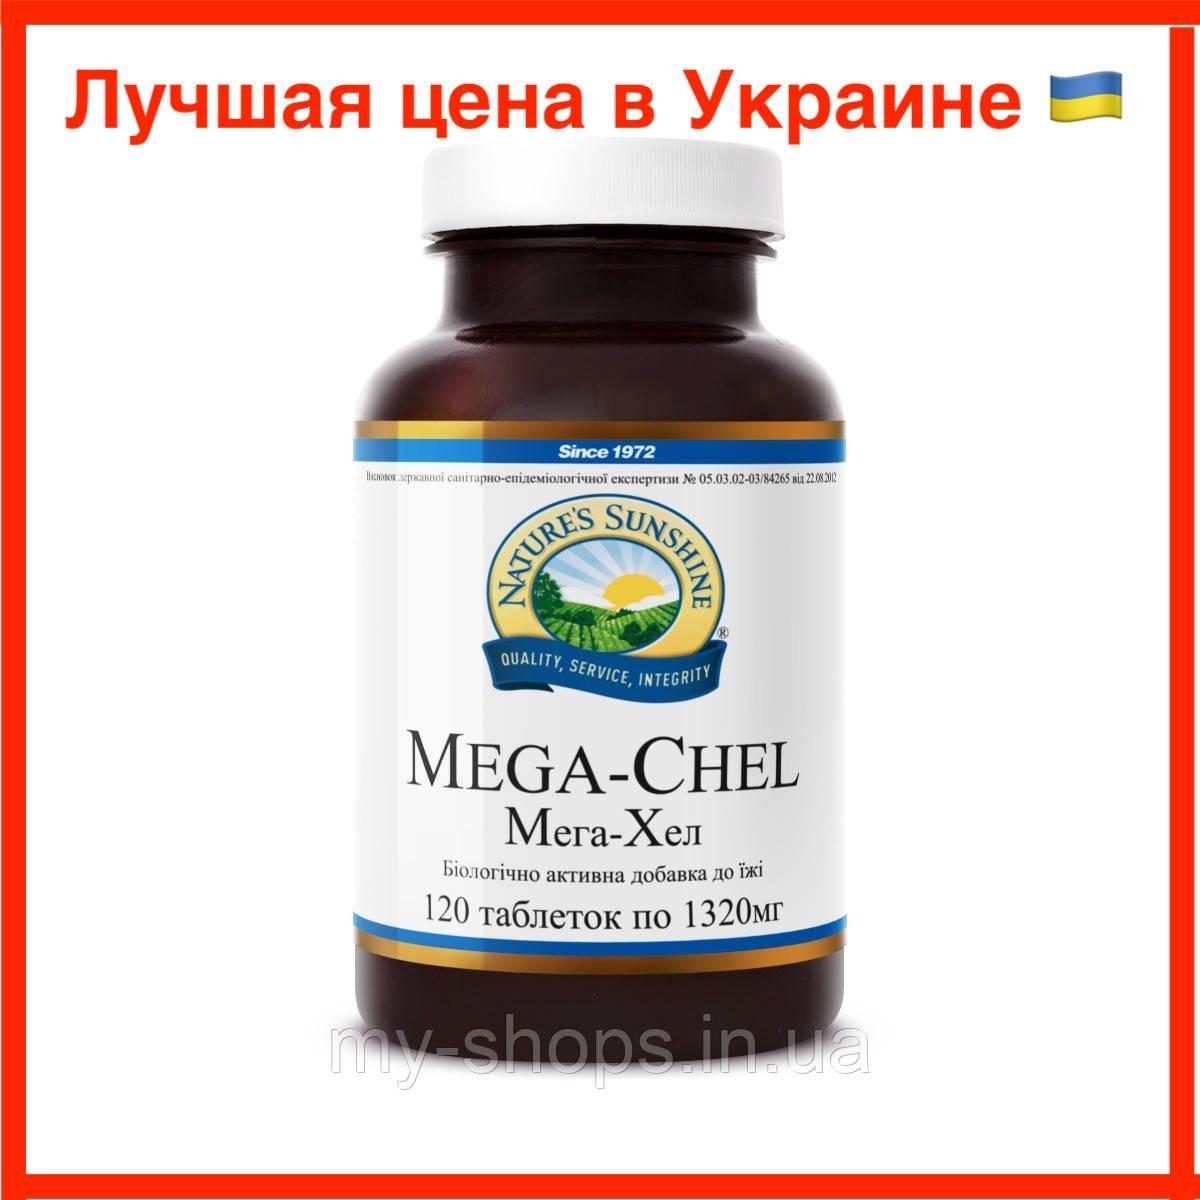 Мега Хел (Mega - Chel) НСП. Мега - Хел NSP. Натуральная БИОДОБАВКА